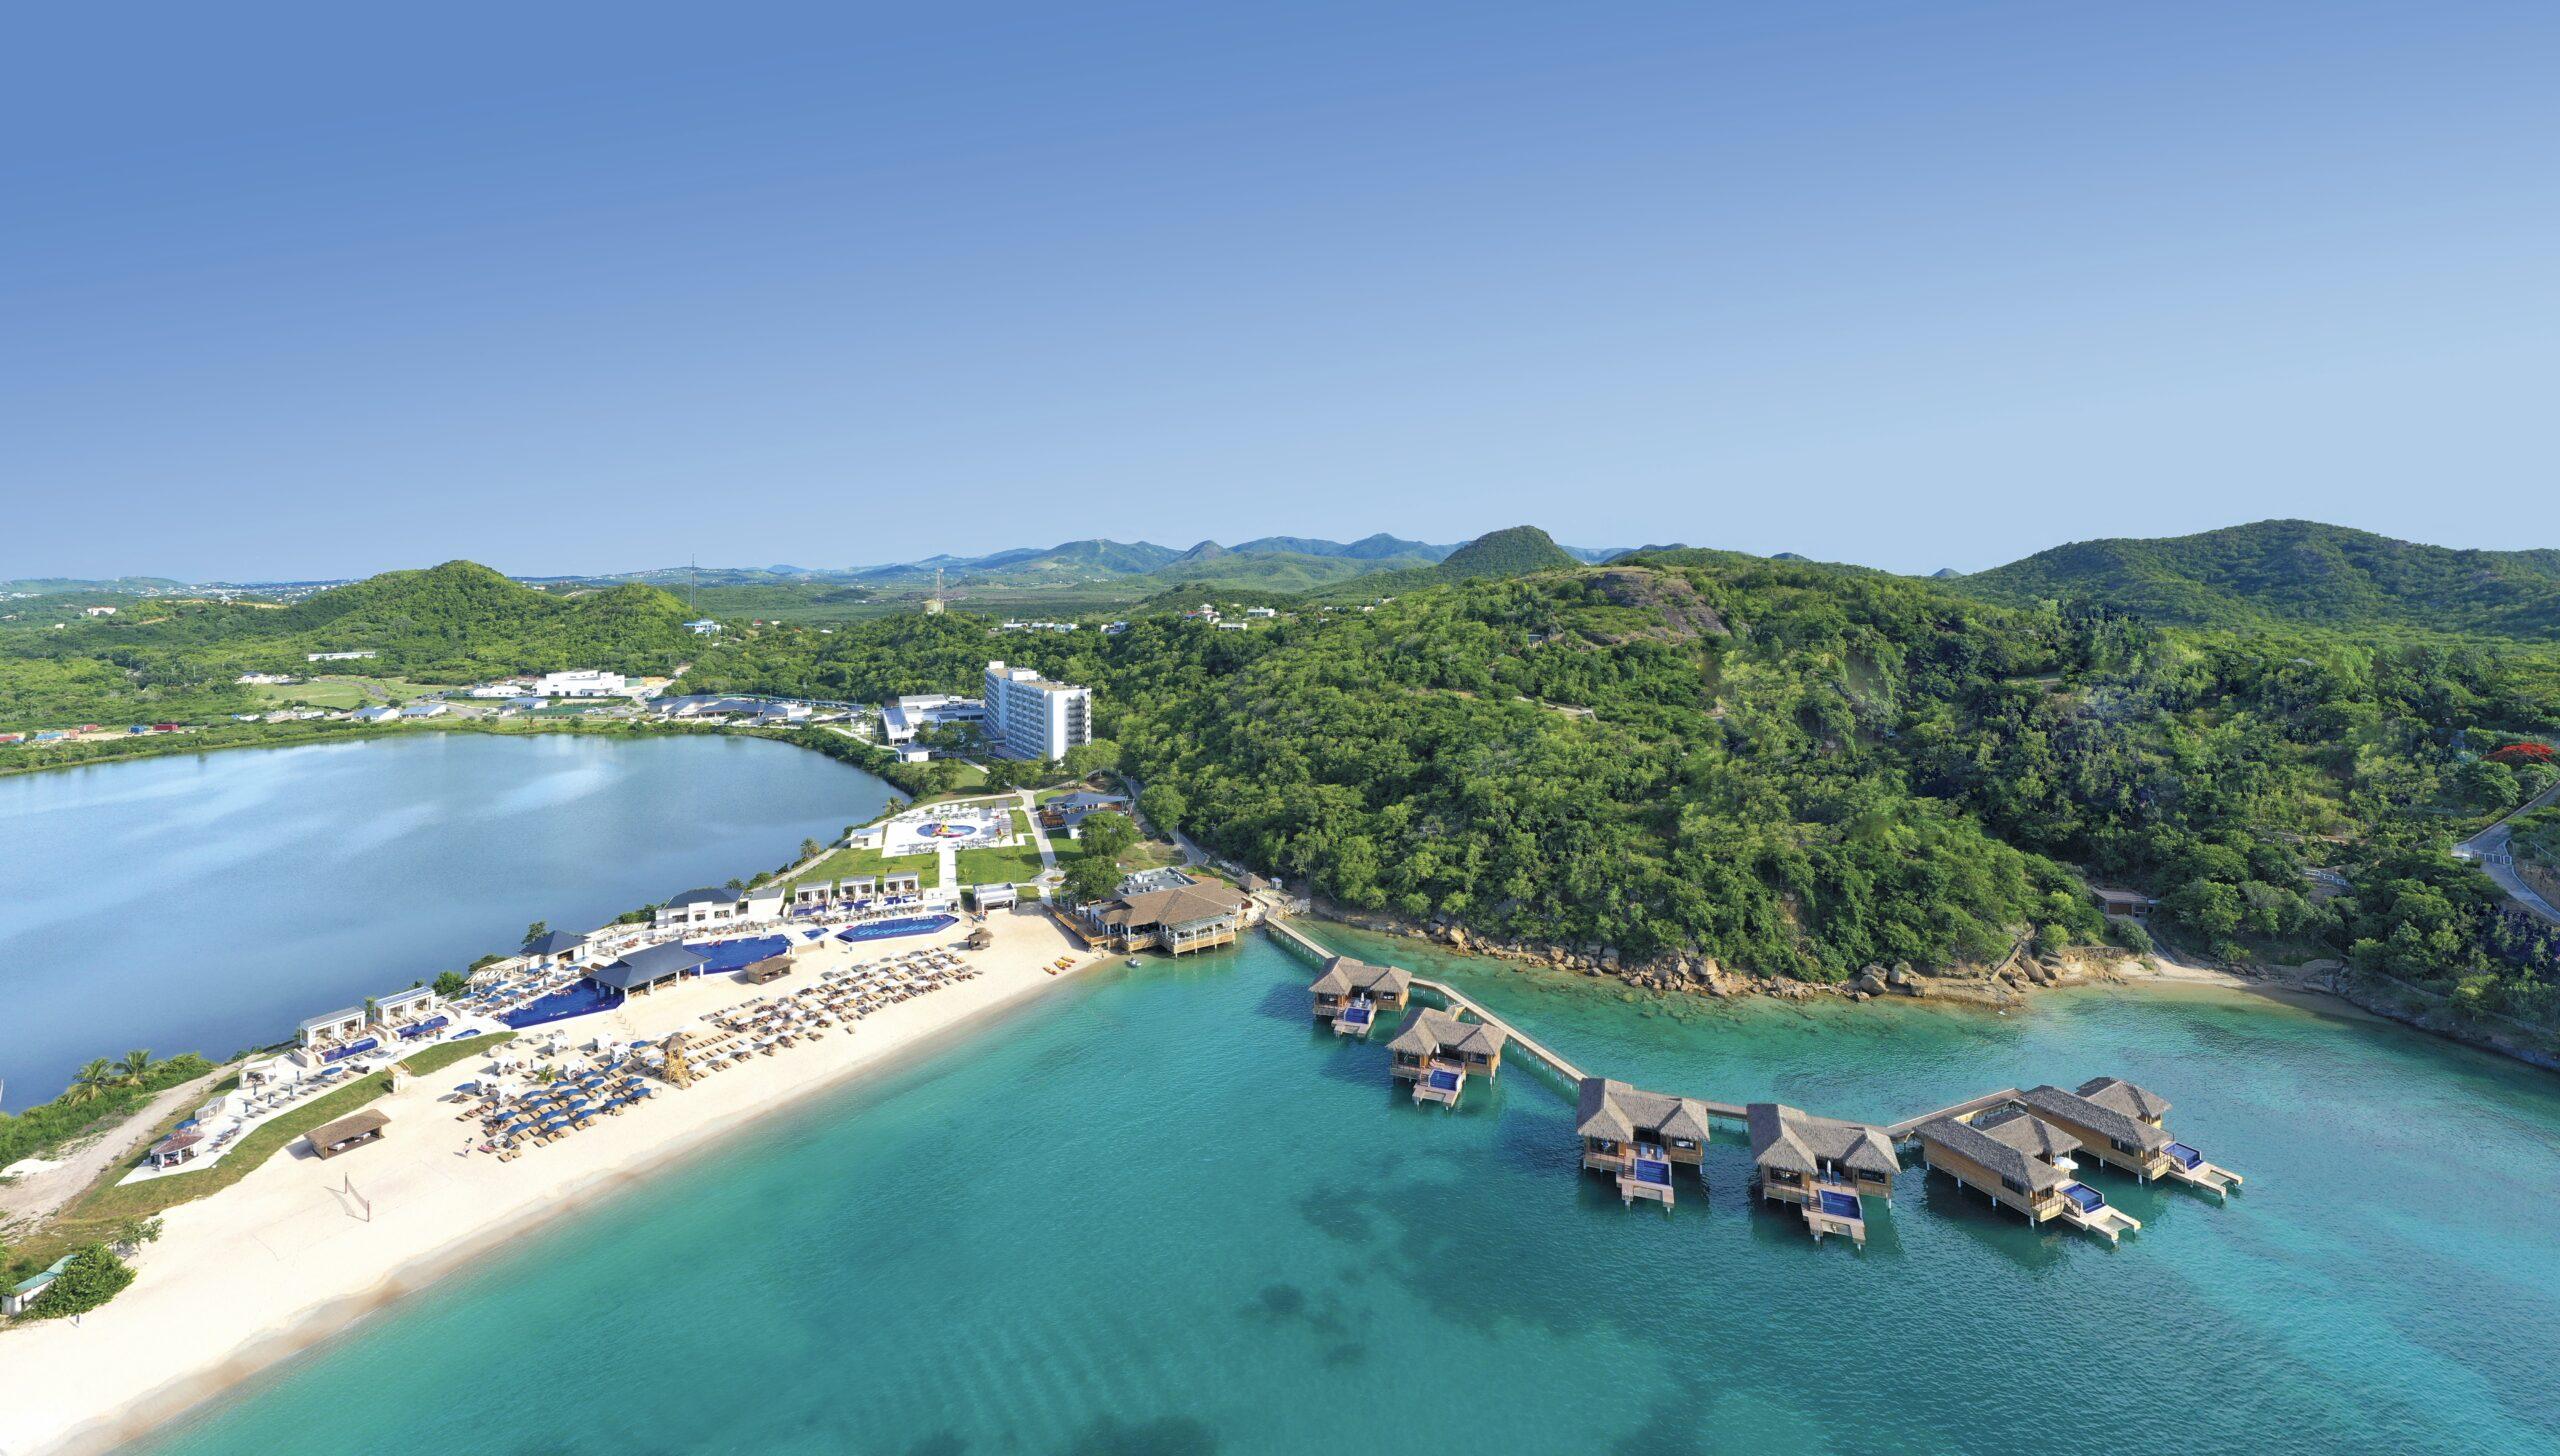 Royalton_Antigua_Aerial.jpg